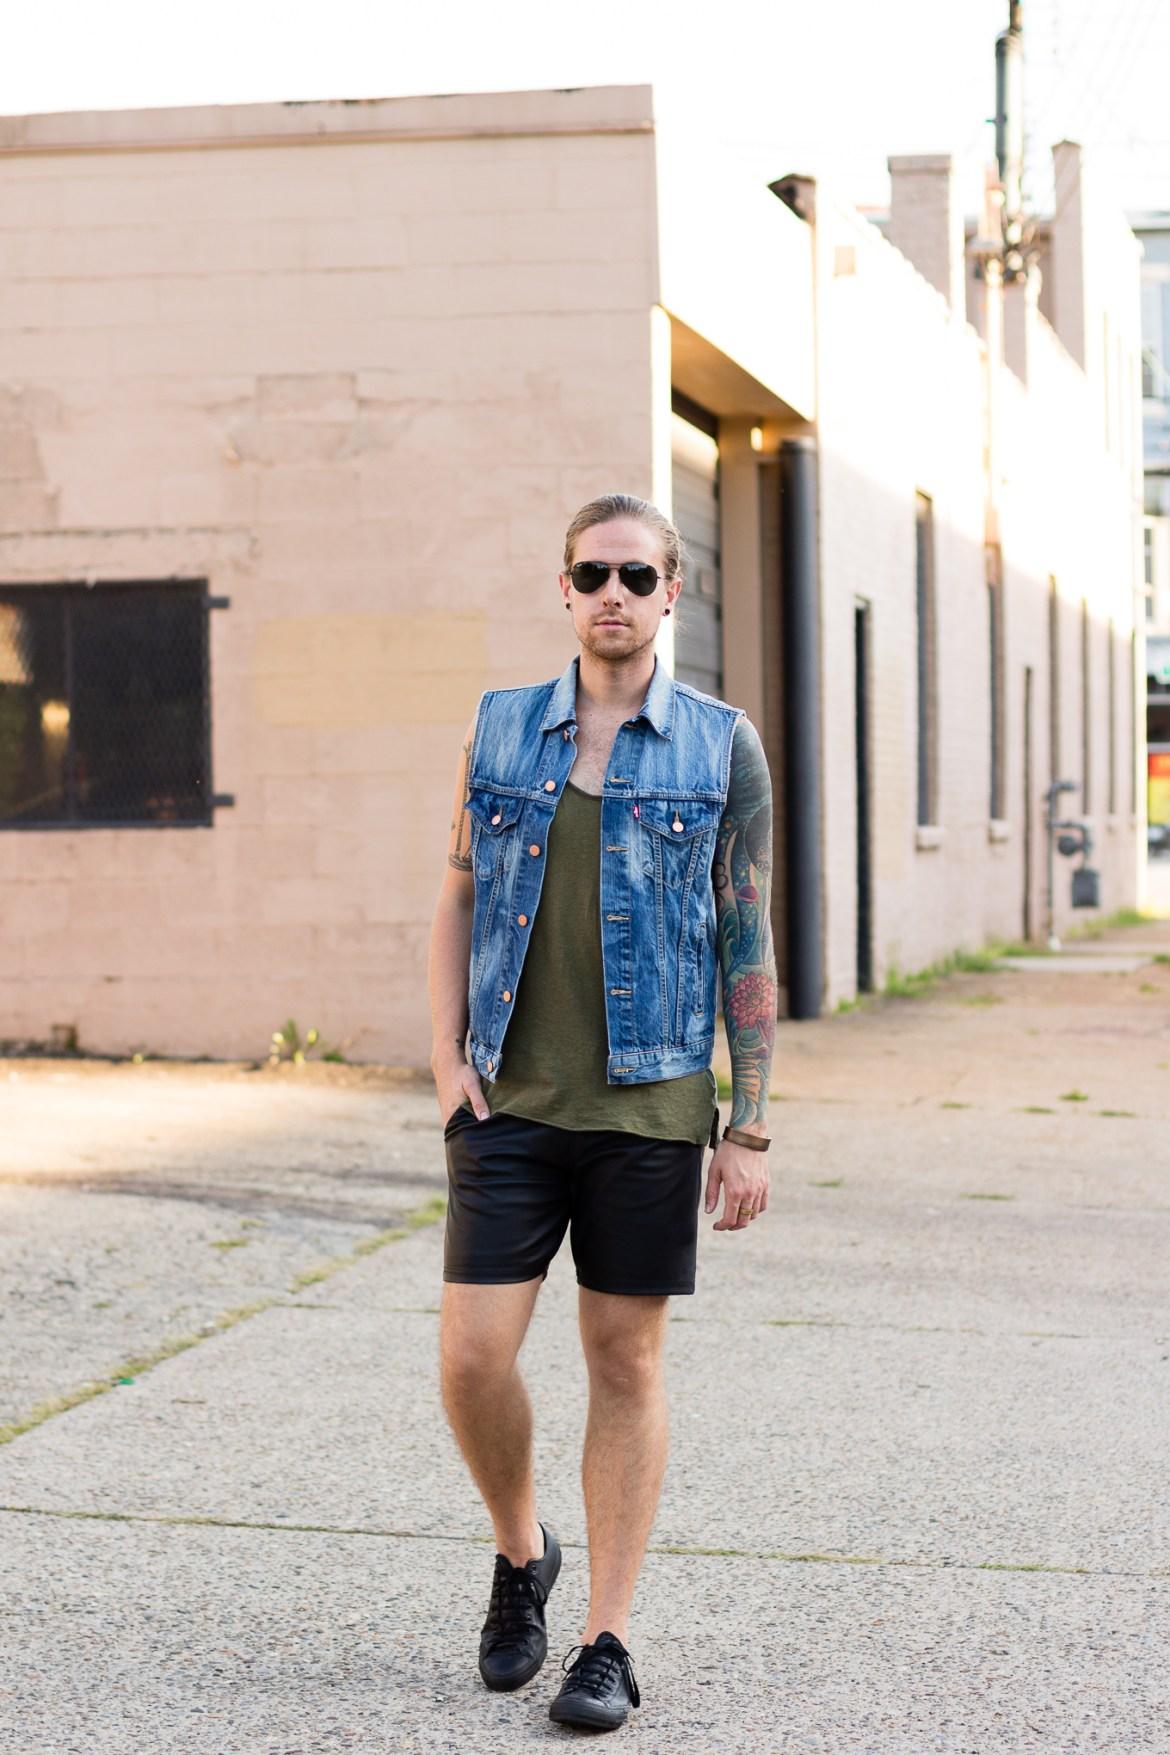 levis denim vest, topman faux leather shorts, converse sneakers, ray-ban aviators, mens fashion blog